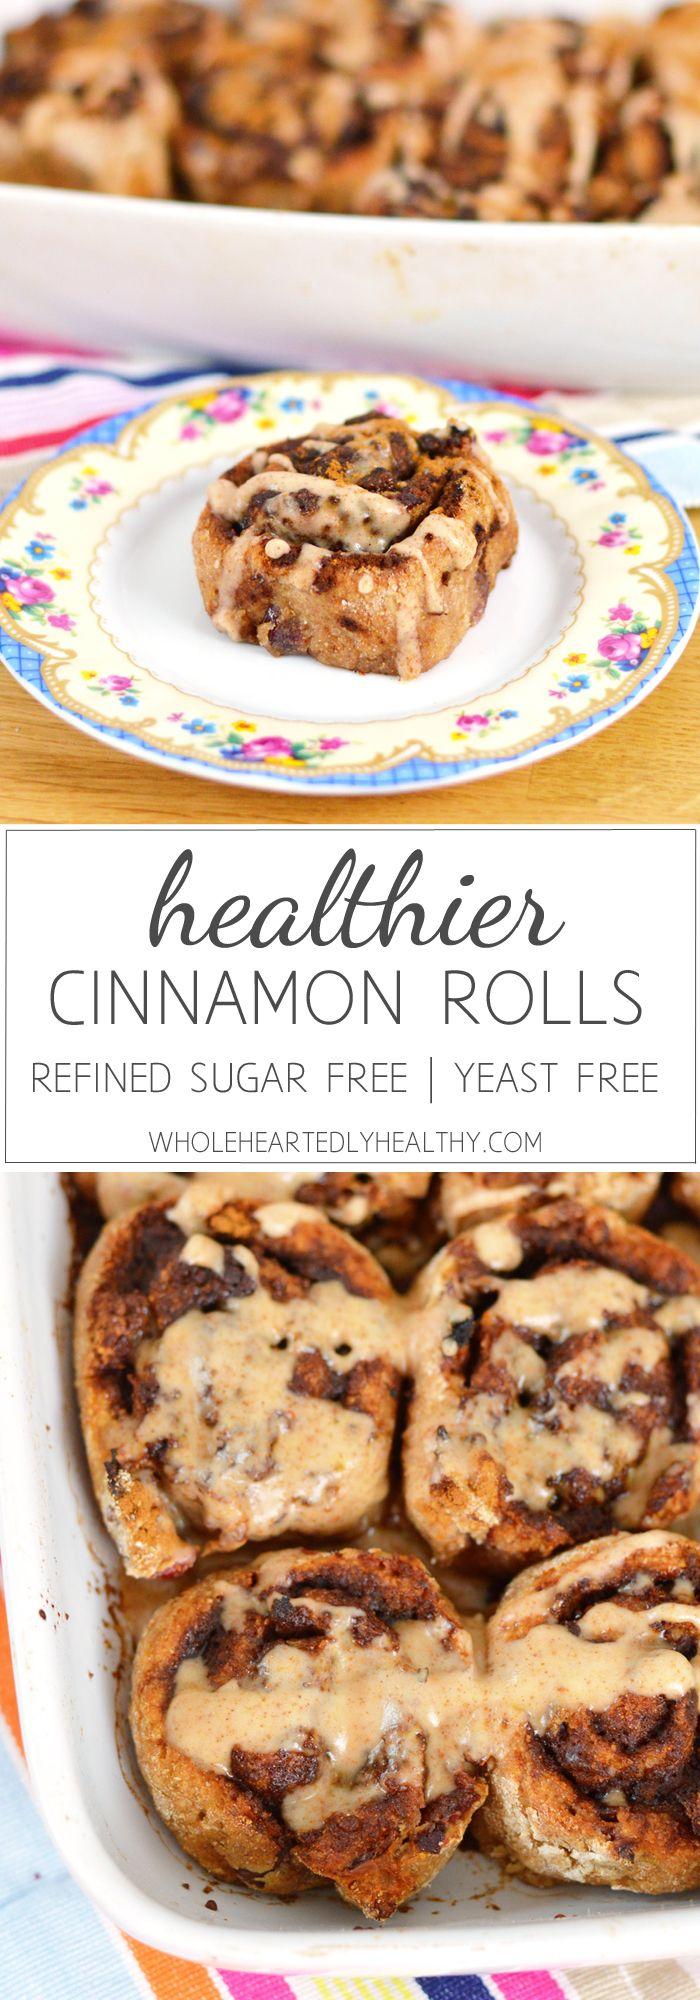 healthy cinnamon roll recipe.jpg